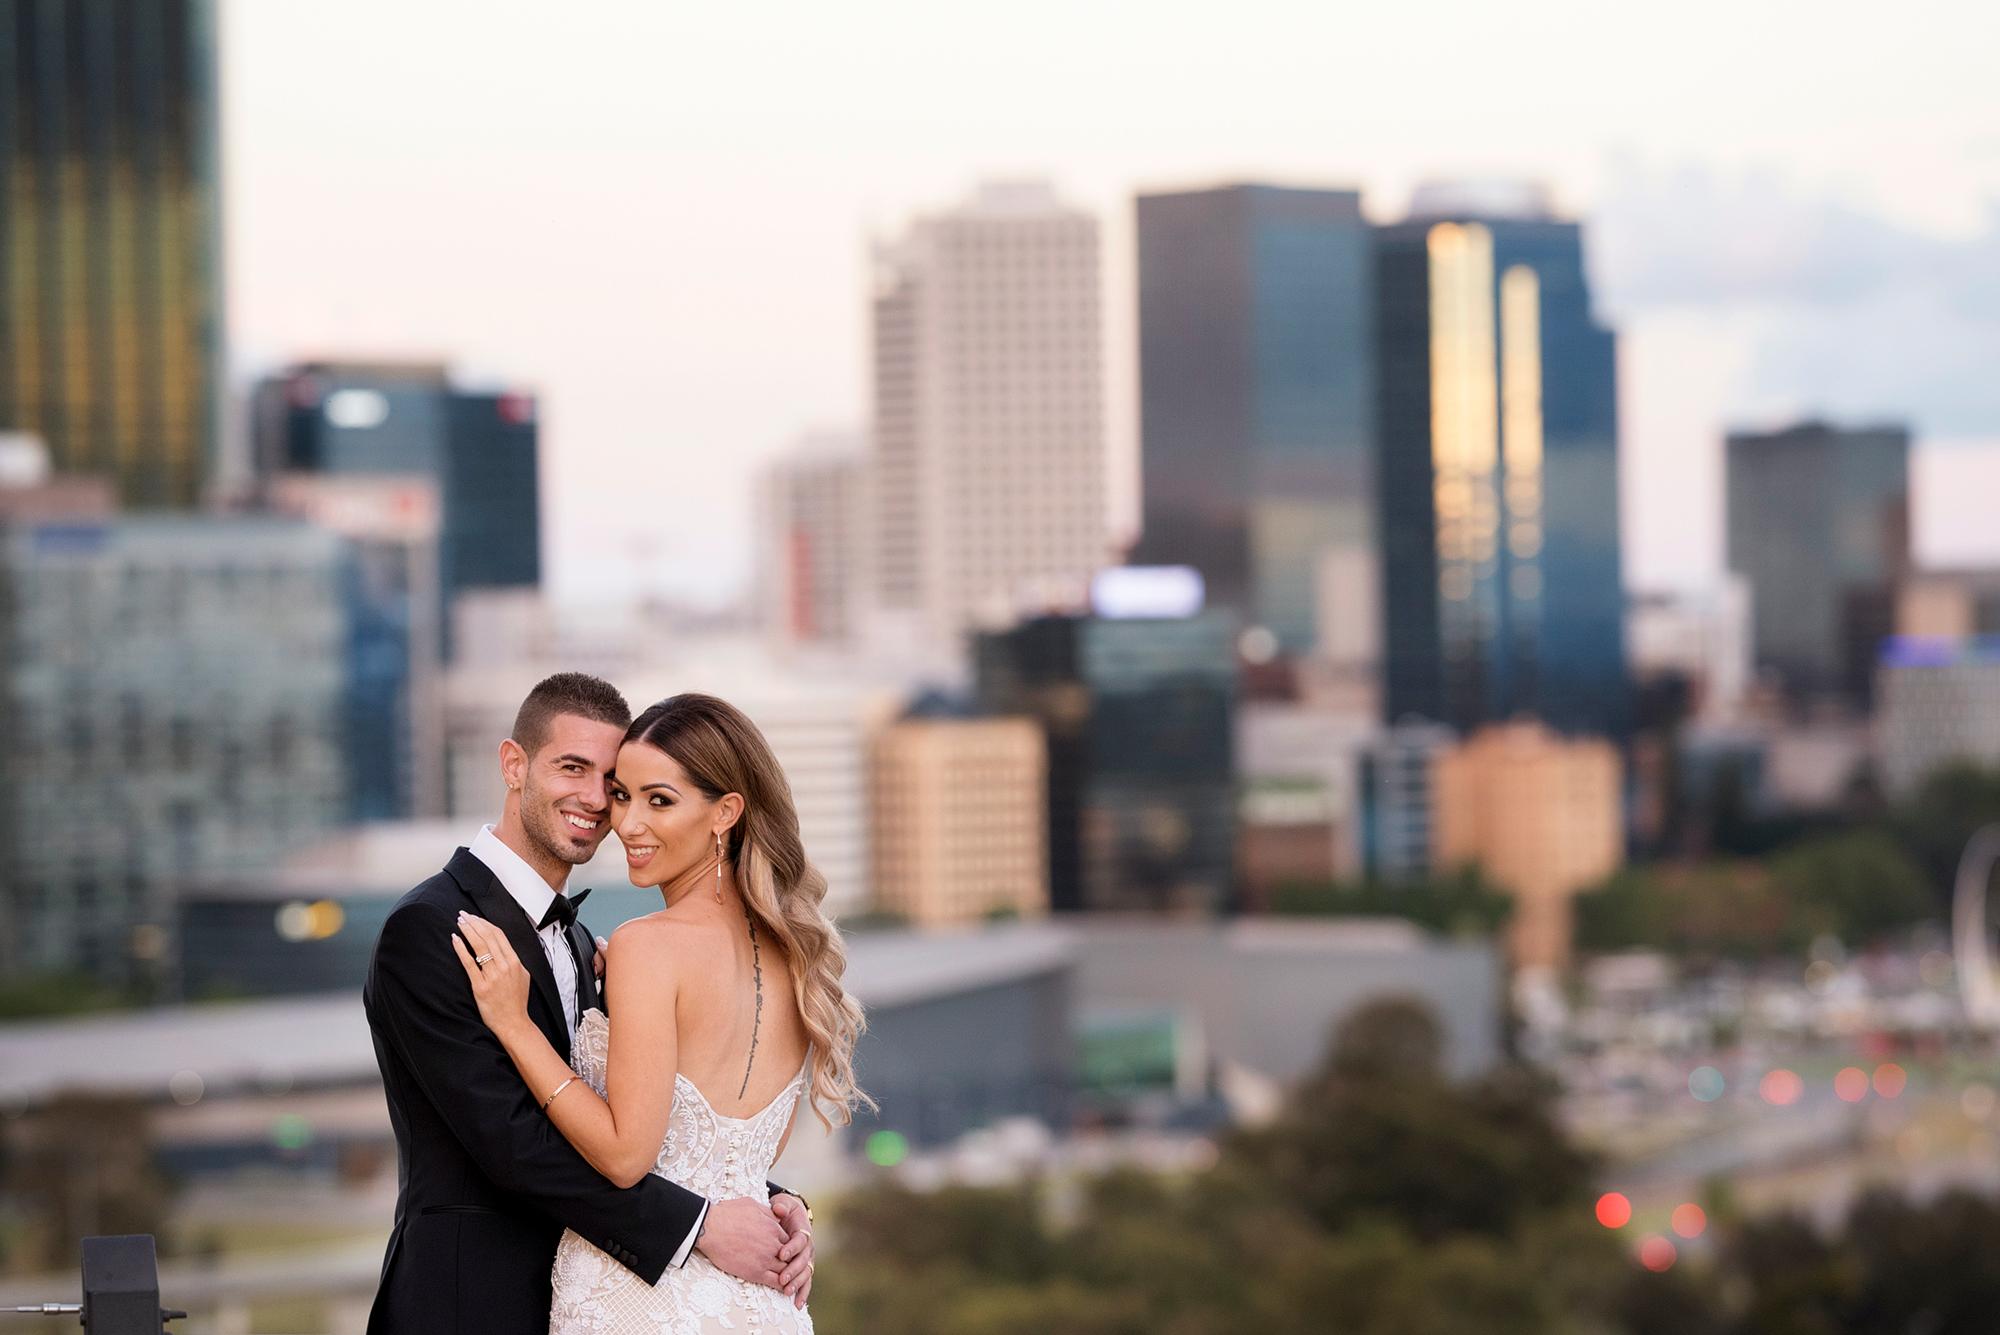 039 wedding photography perth_.jpg